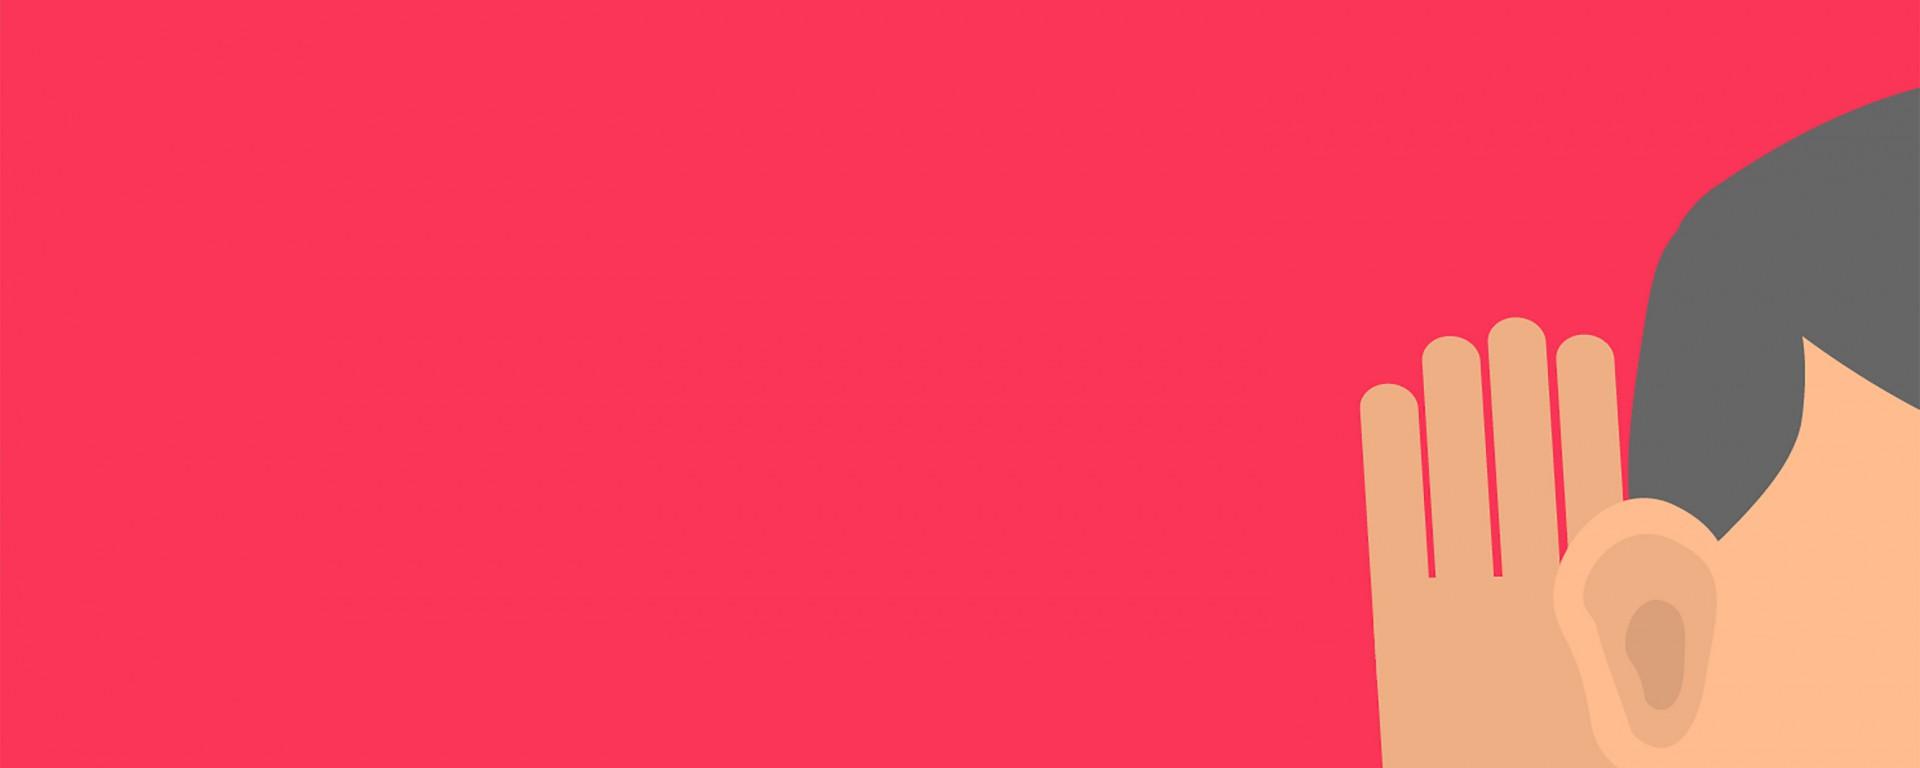 shutterstock_213196012-[Converted]